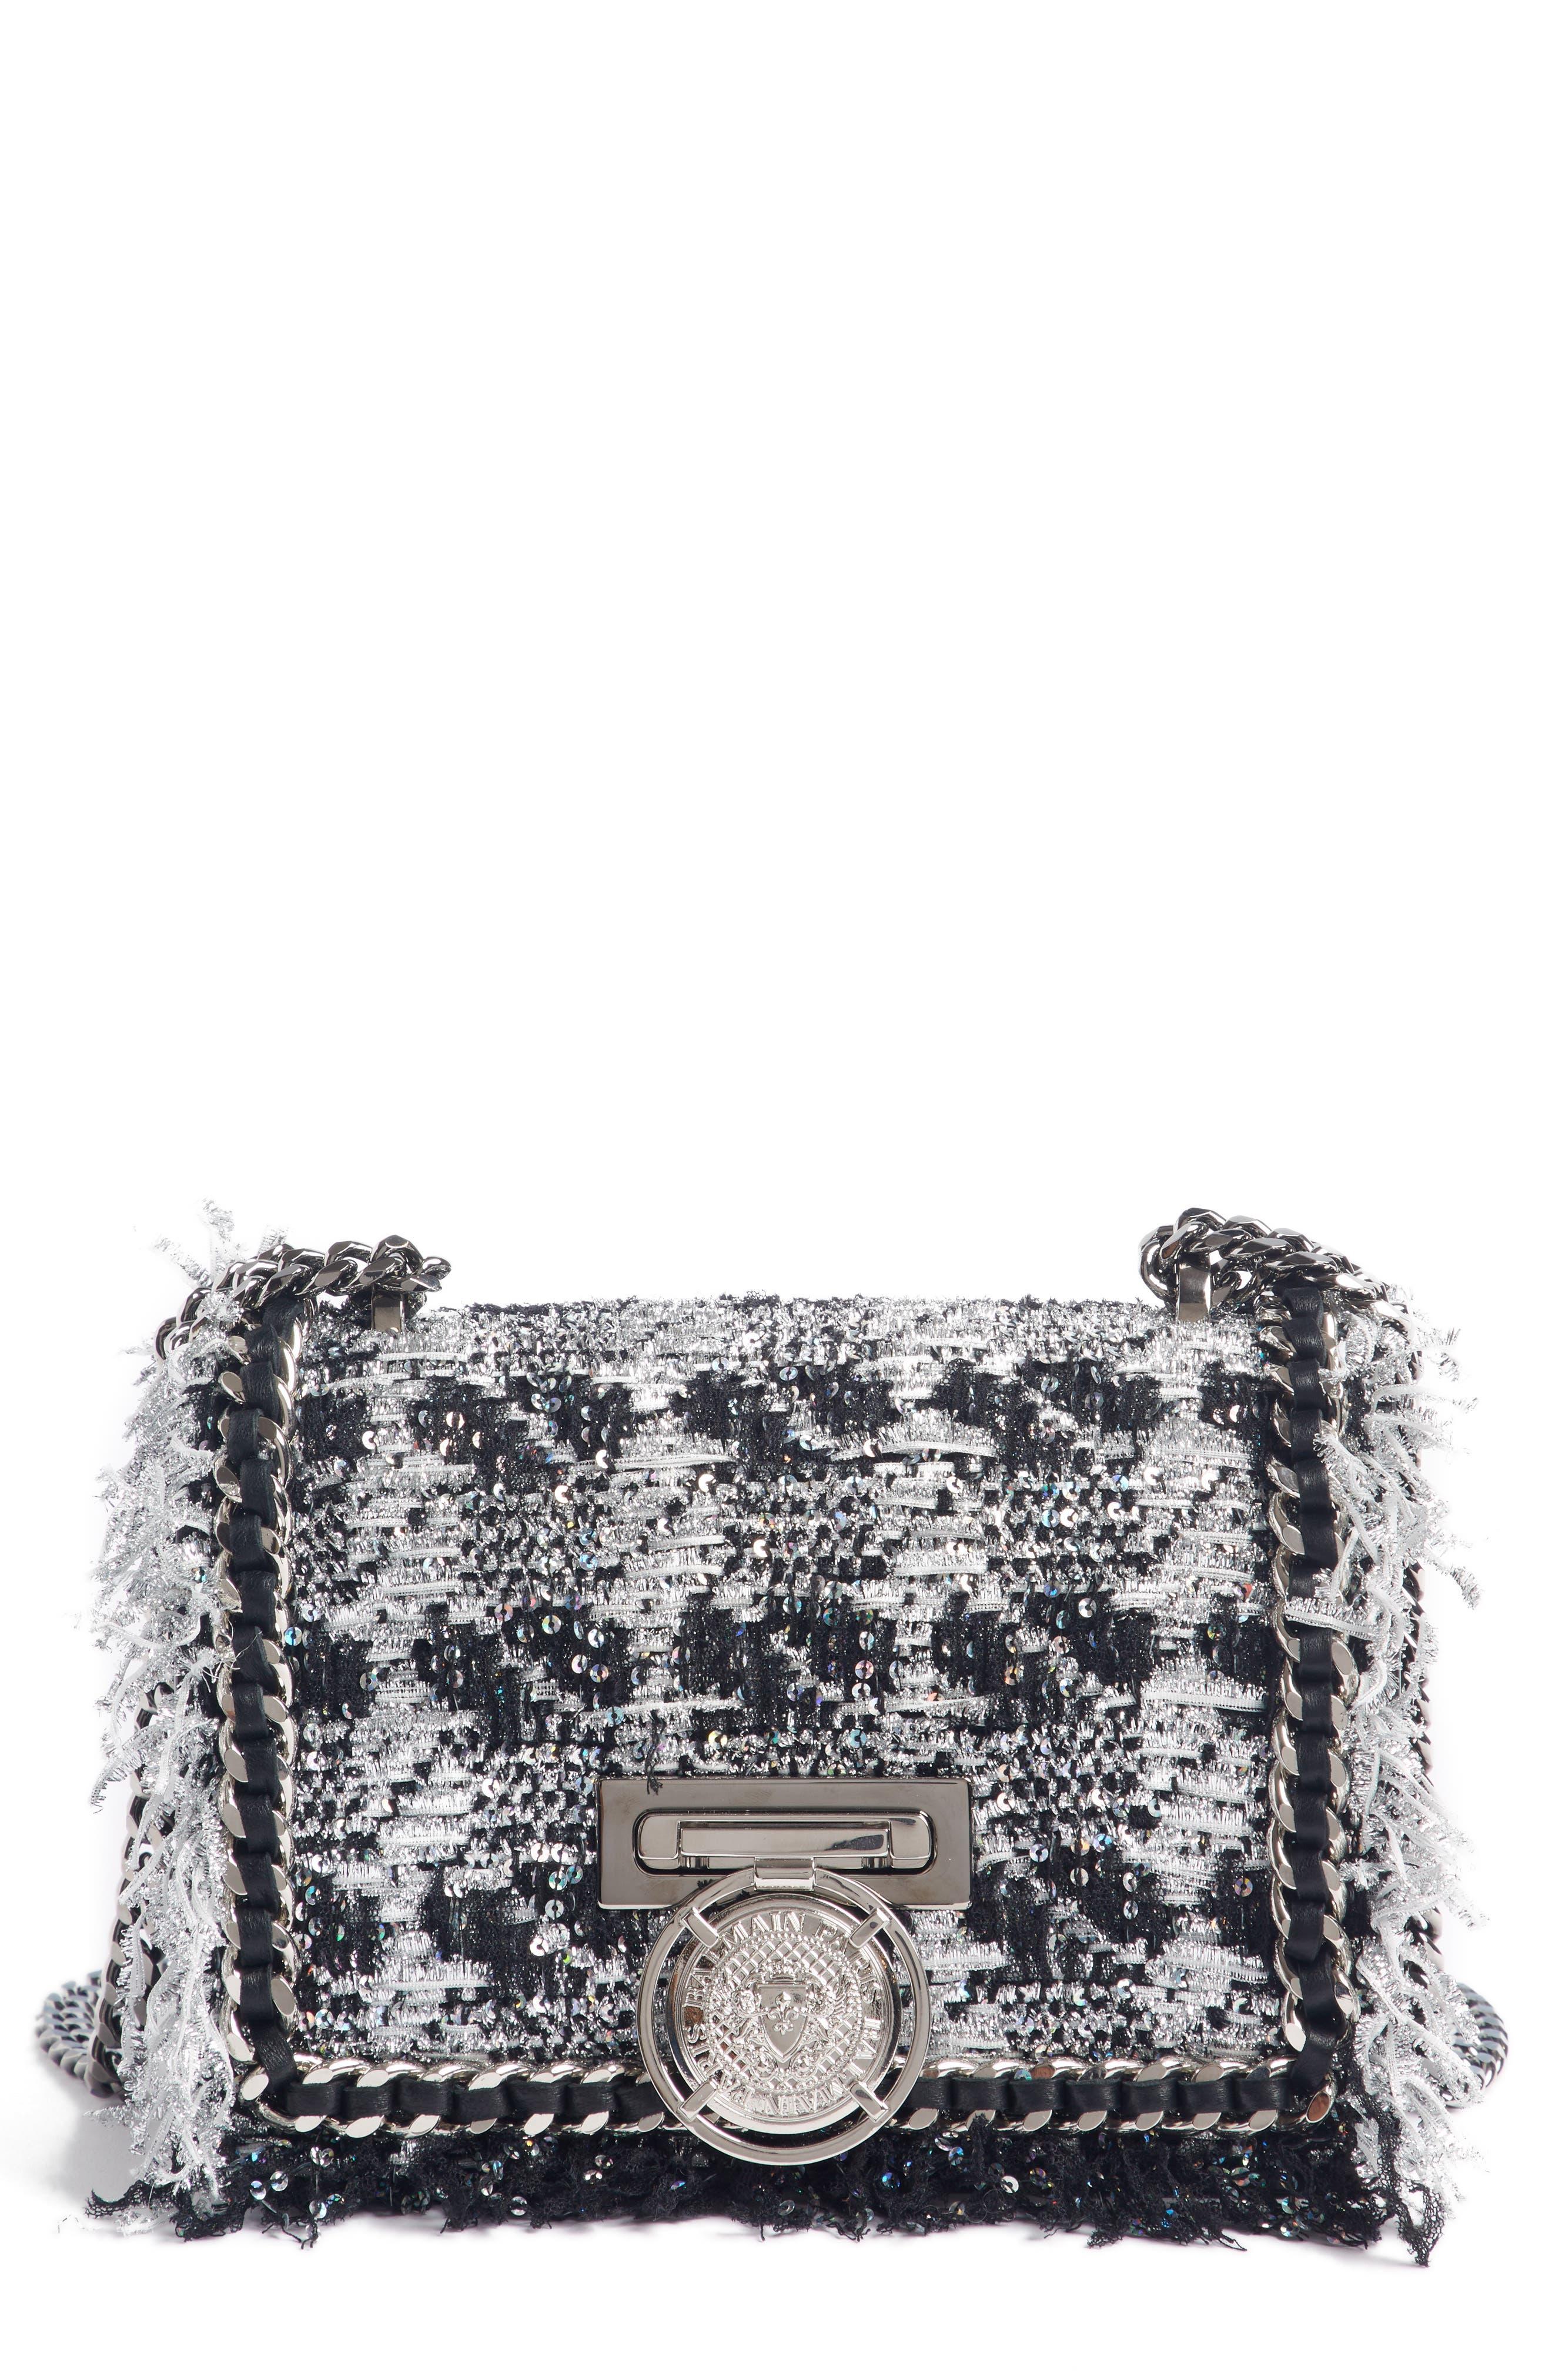 Metallic Tweed & Leather Box Shoulder Bag,                         Main,                         color, NOIR/ ARGENT